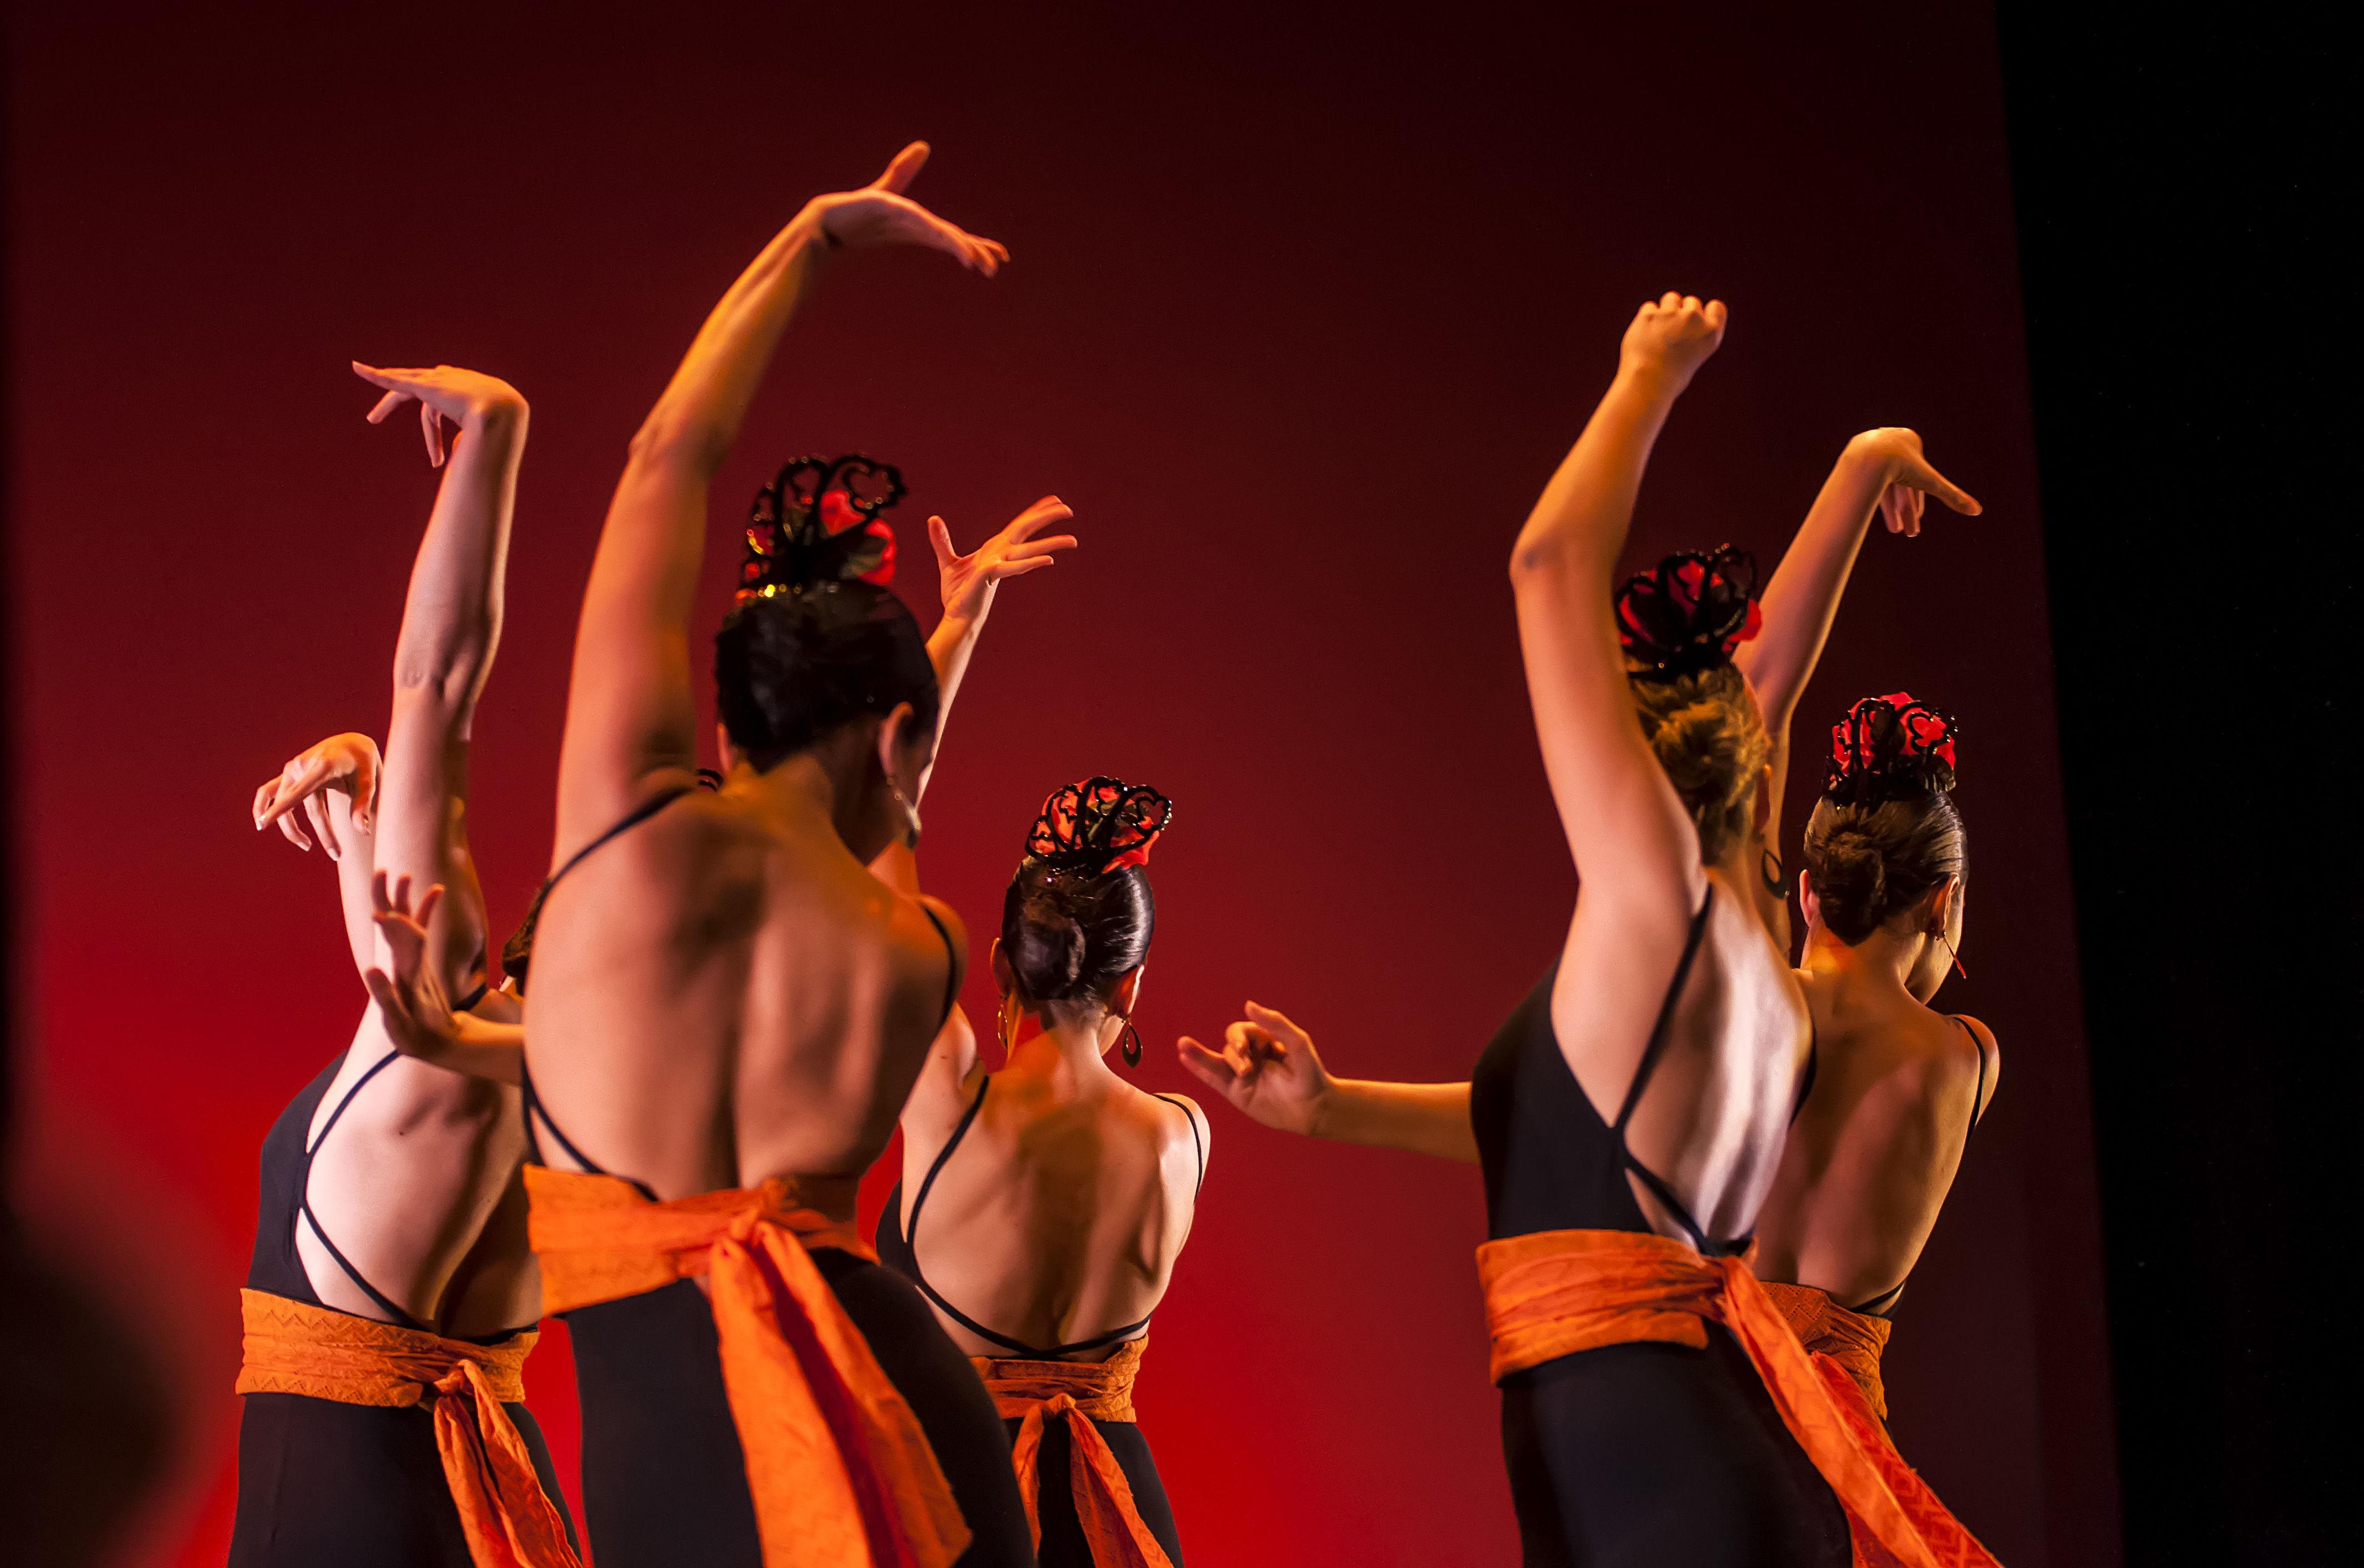 Bailes en Alcalá de Henares